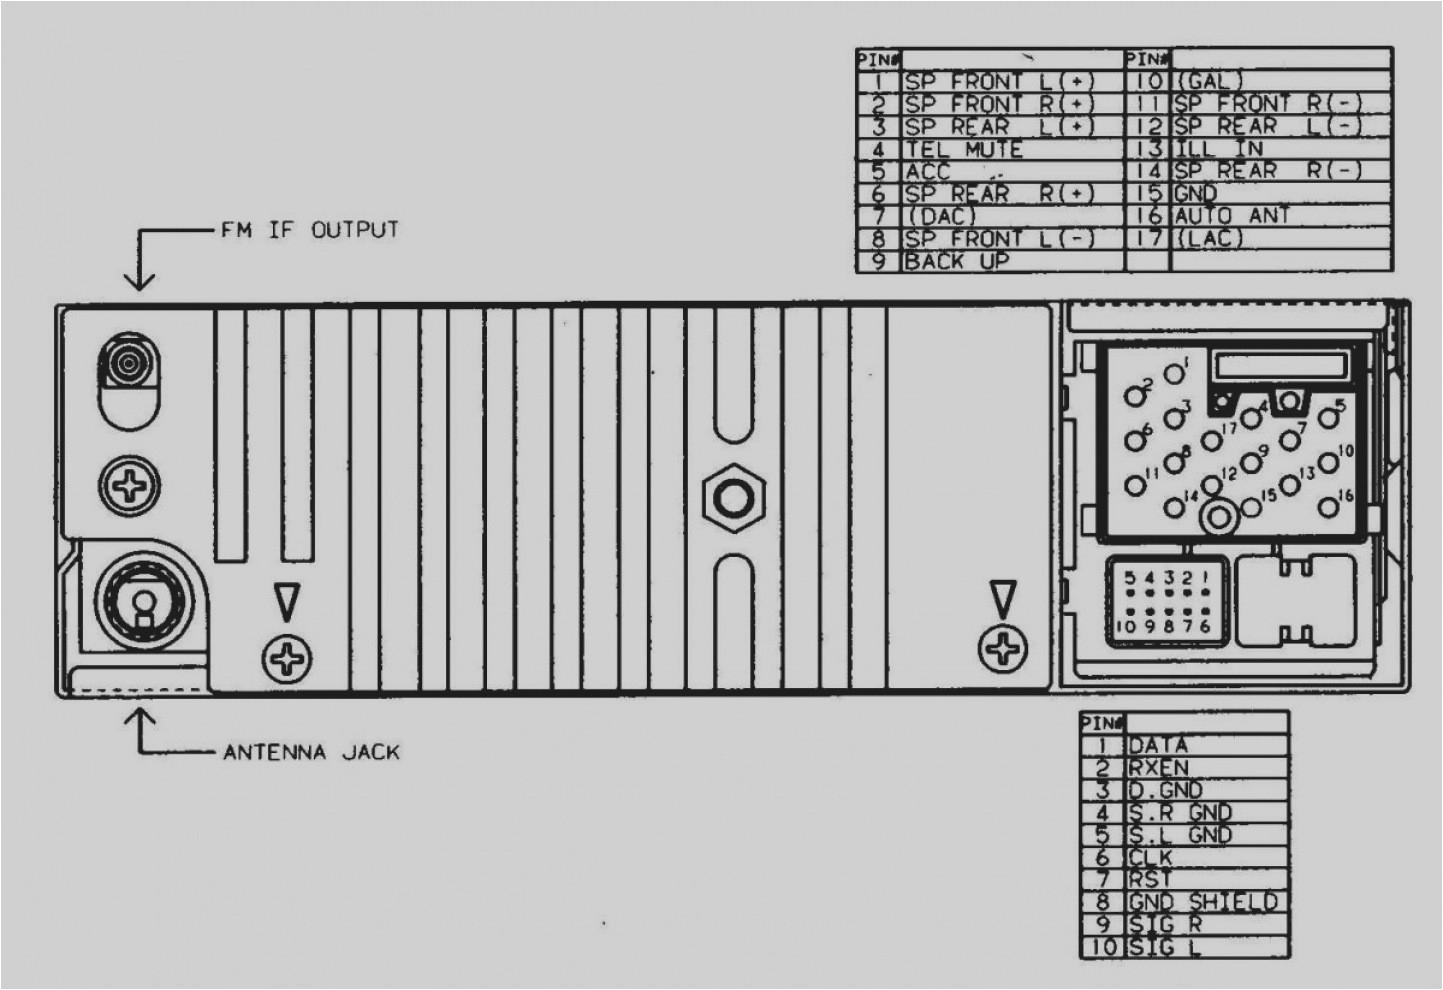 2000 bmw e46 radio wiring diagram wire data schema u2022 rh theboldblonde co 2001 bmw x5